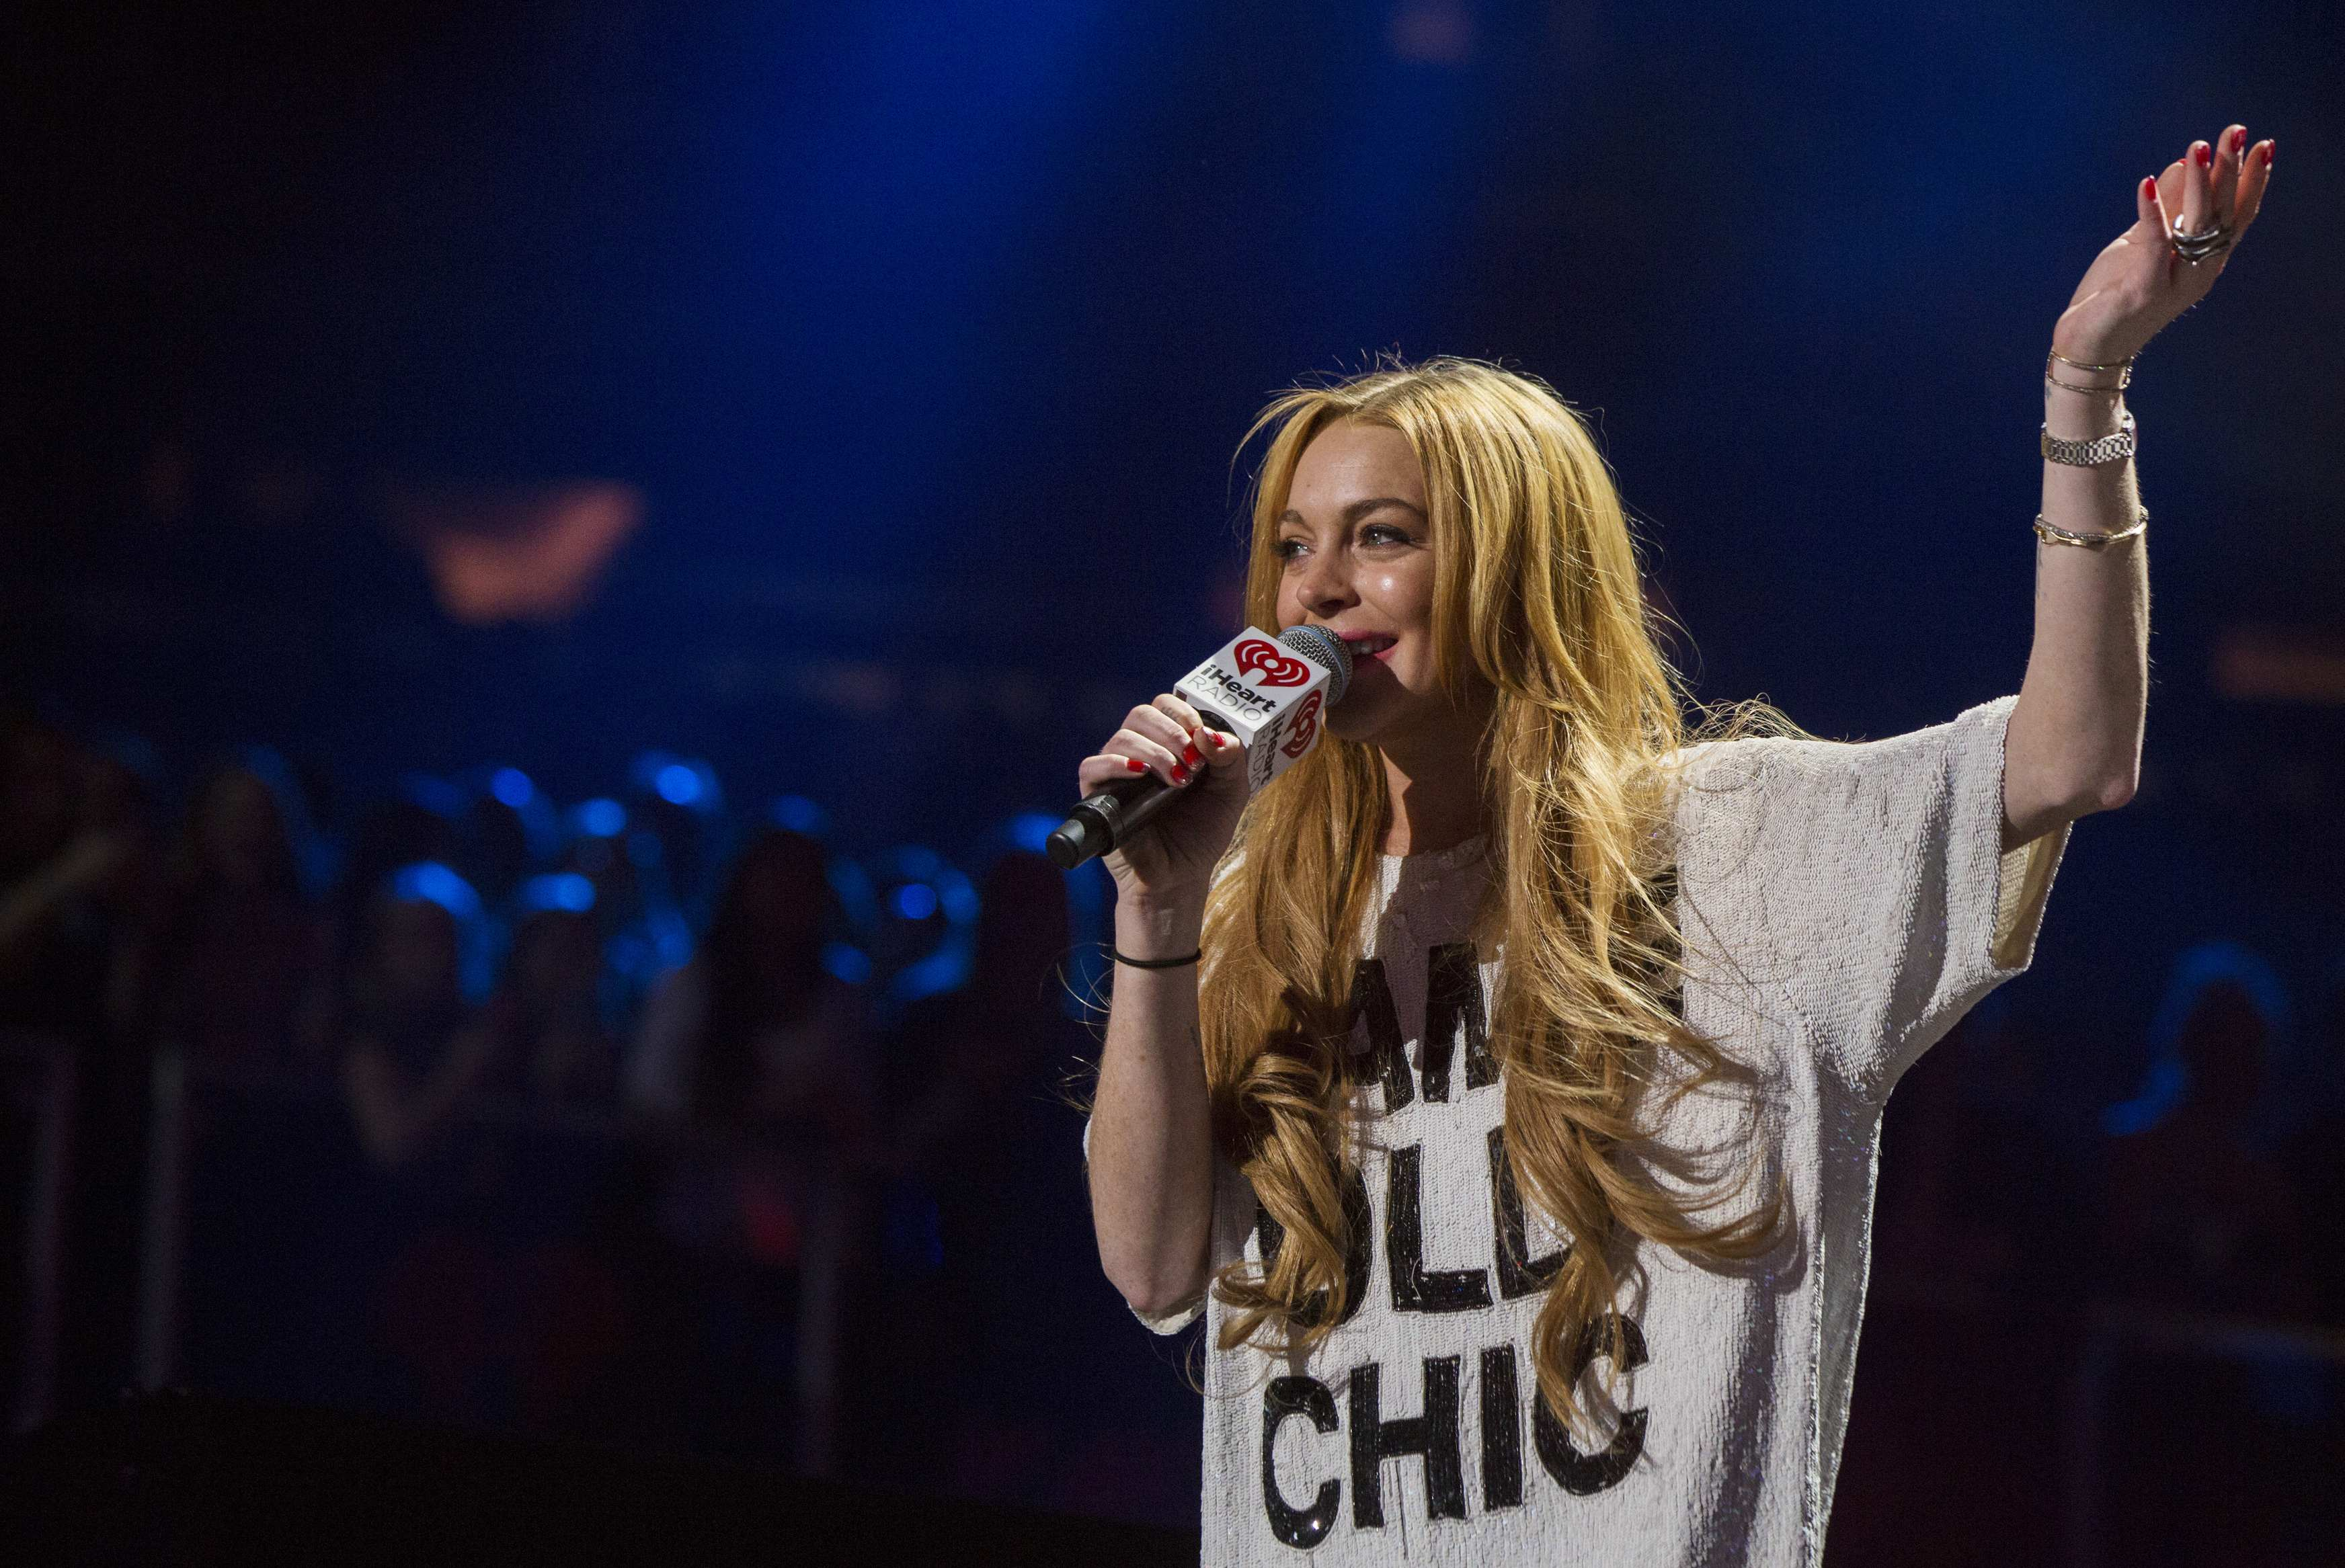 Lindsay Lohan no Jingle Ball, em Nova York